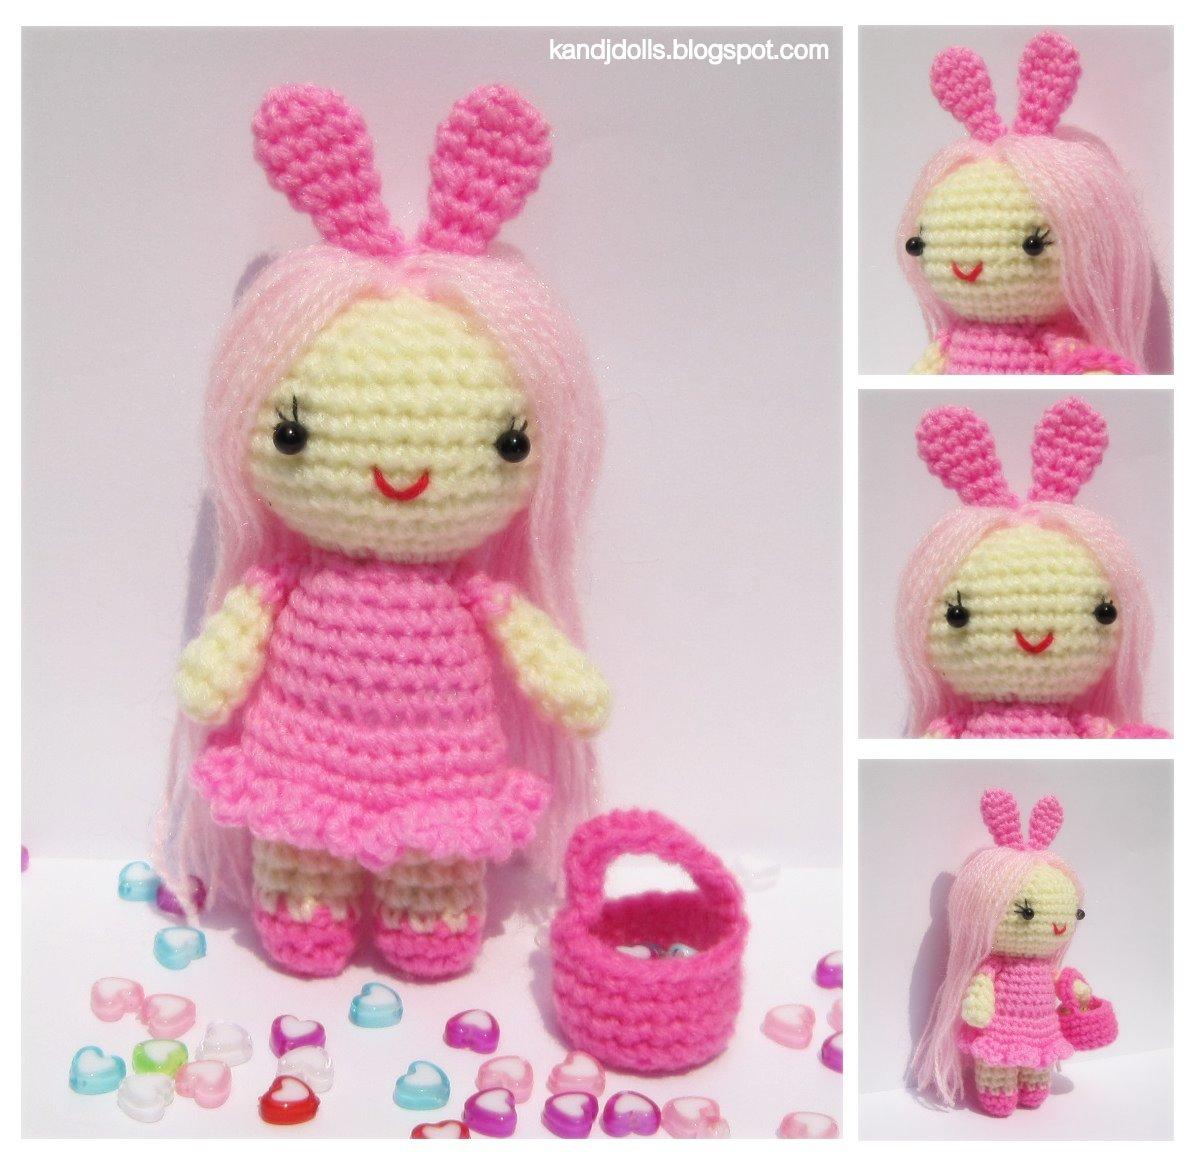 Blog Amigurumi Francais : Petite Dame Rose - Patron d Amigurumi Gratuit - Amigurumi ...